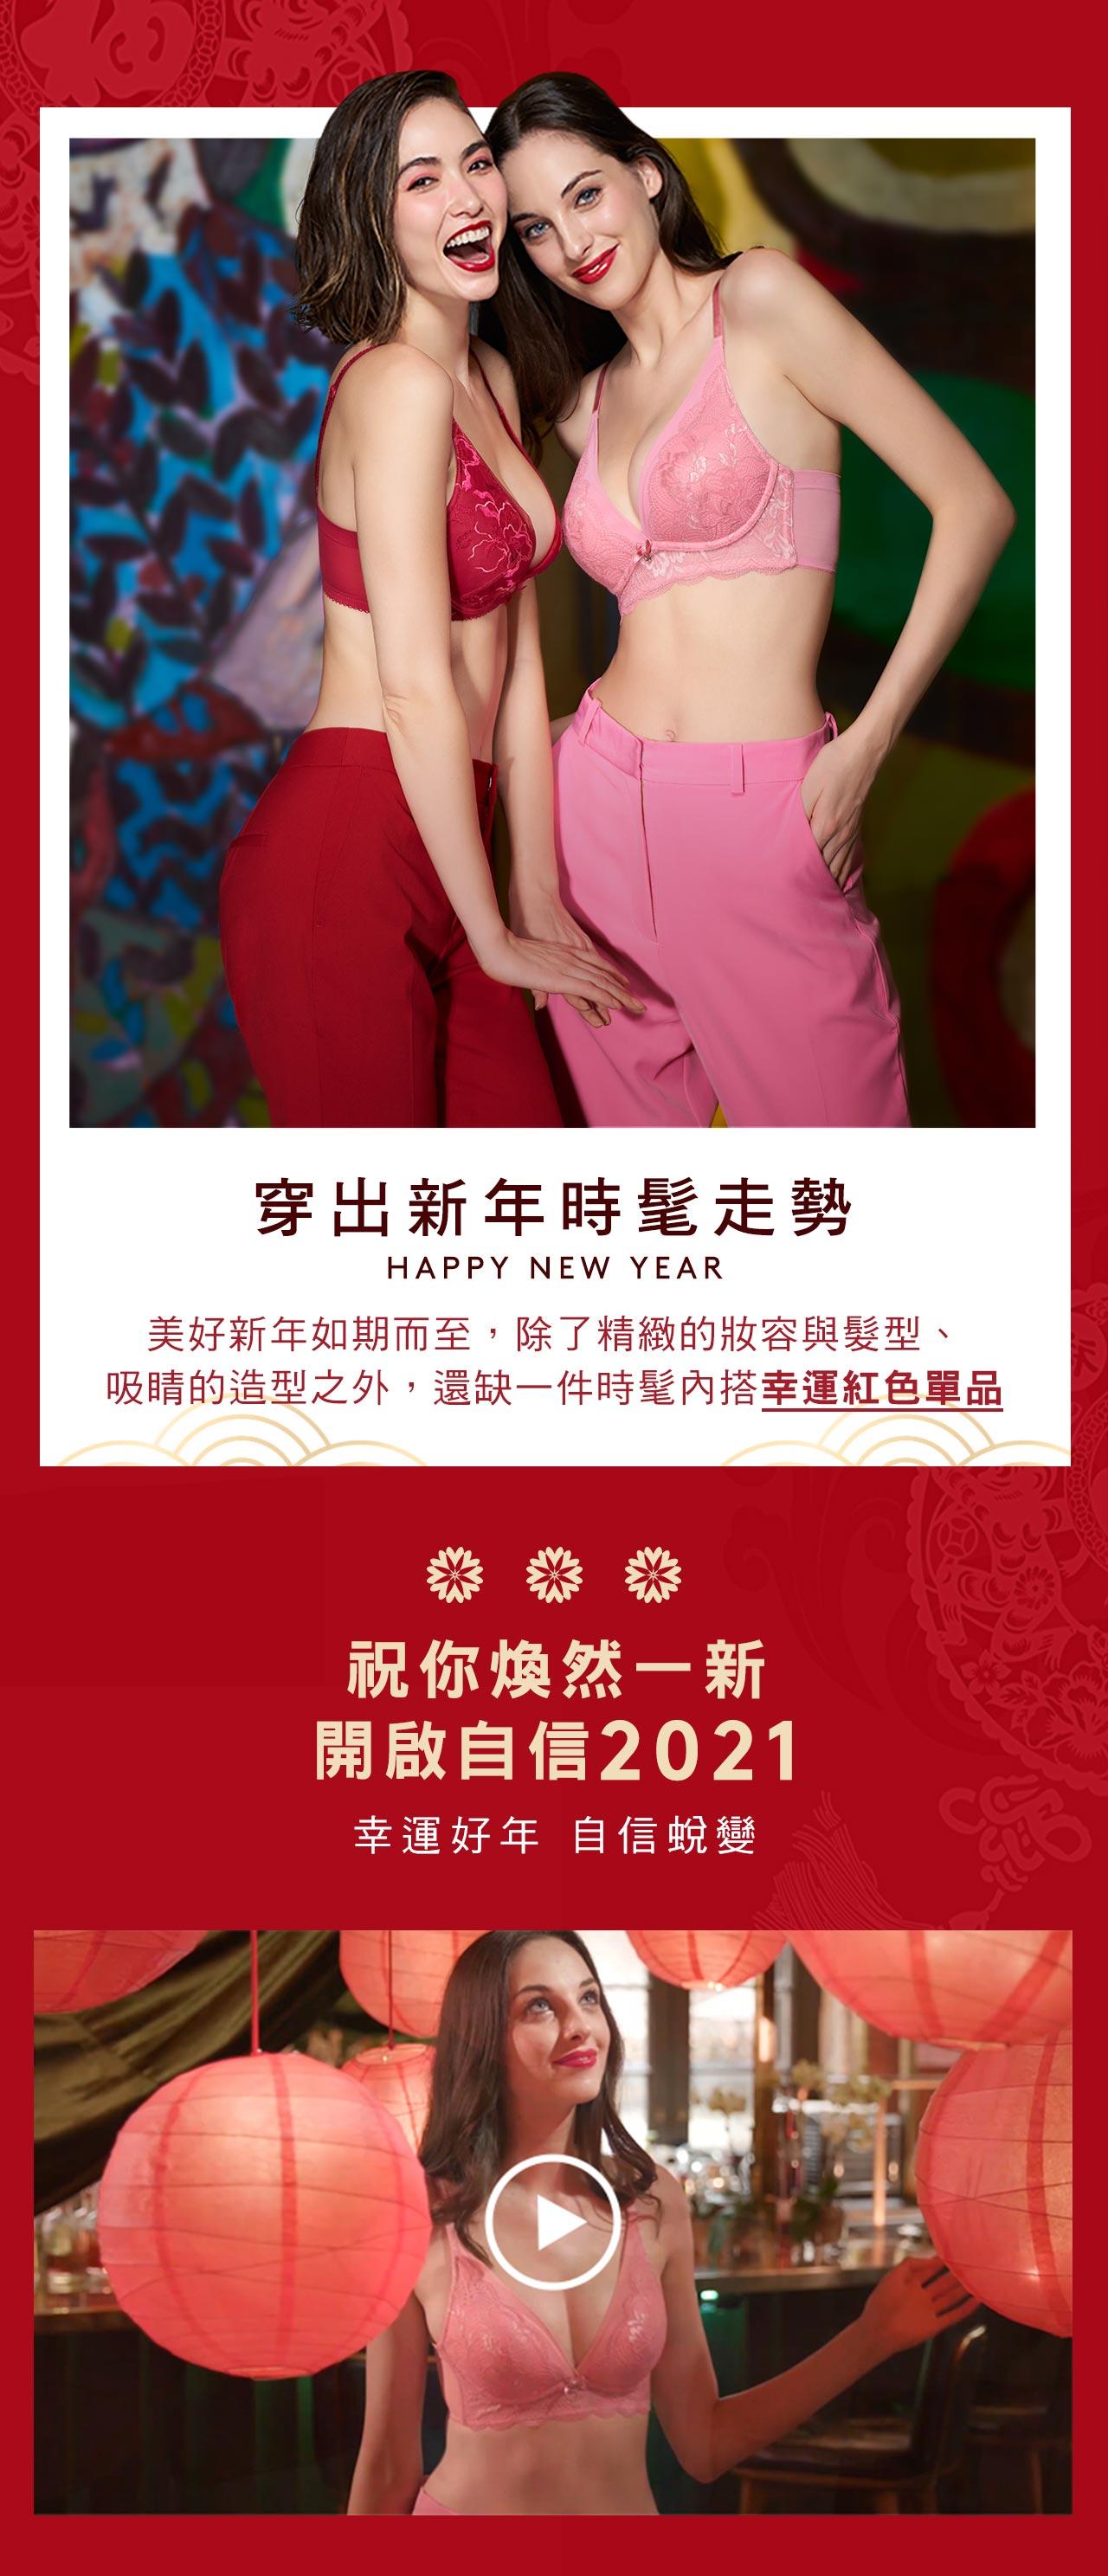 2021-CNY-1-1